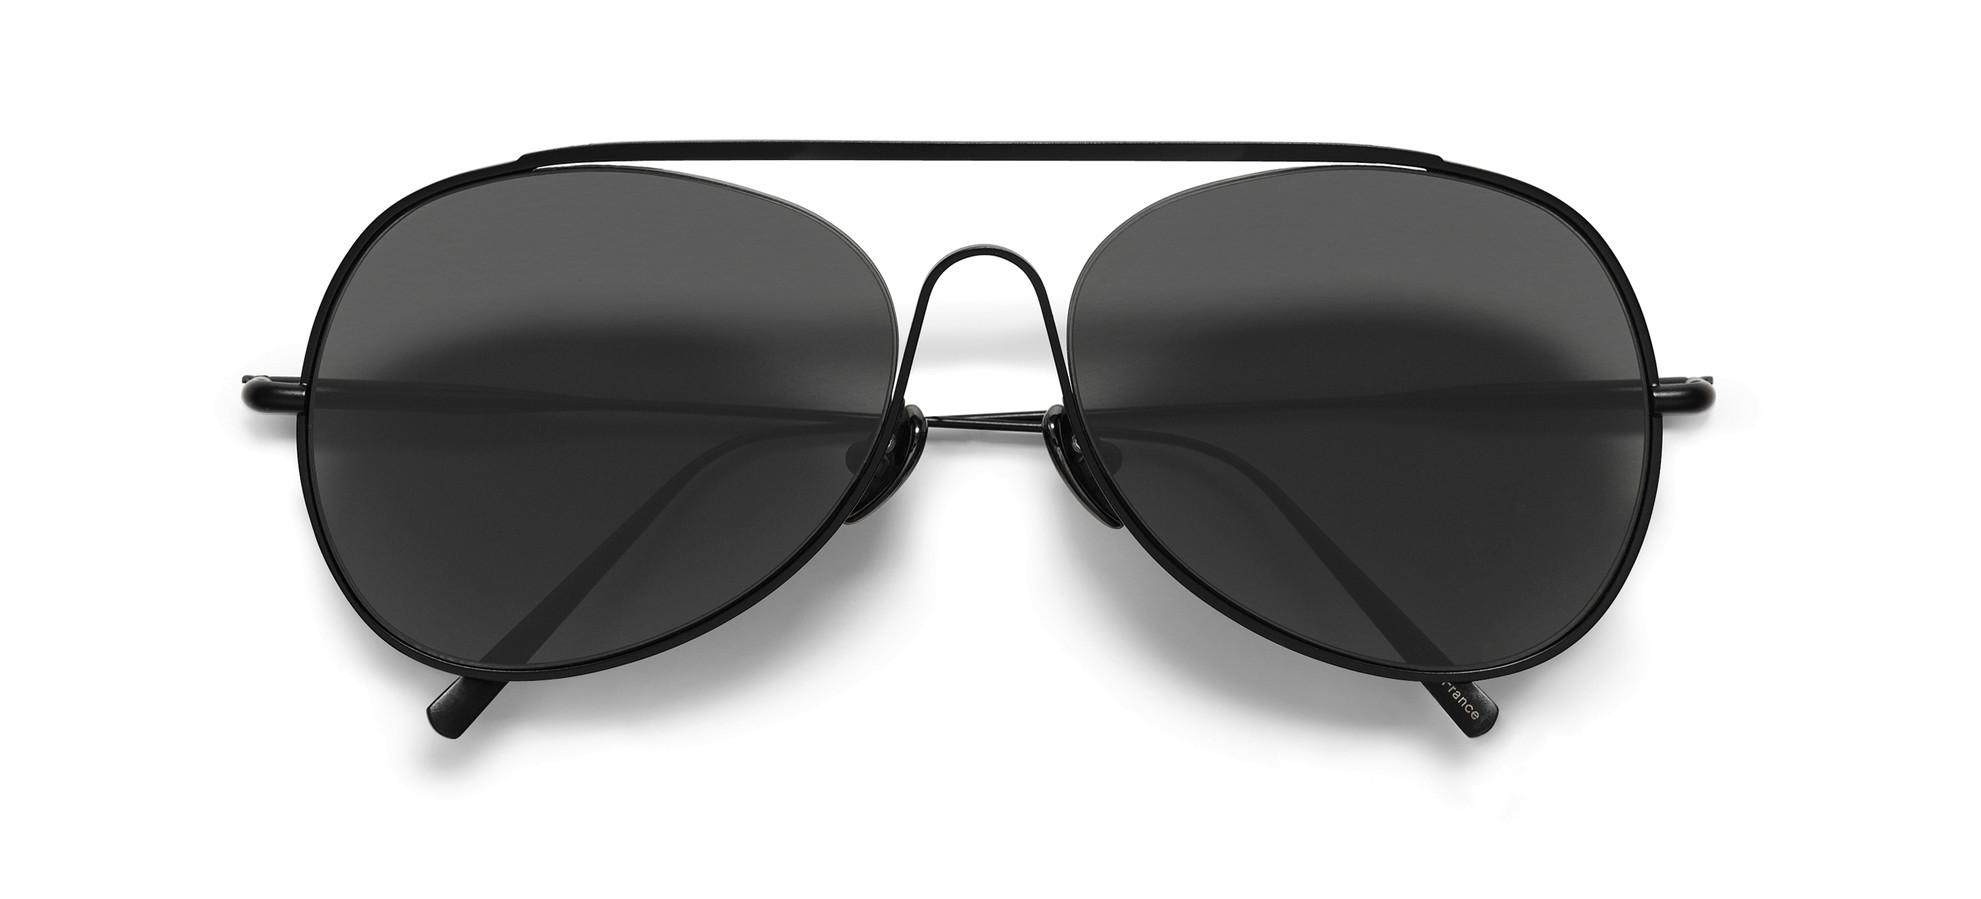 Acne Studios Eyewear Collection